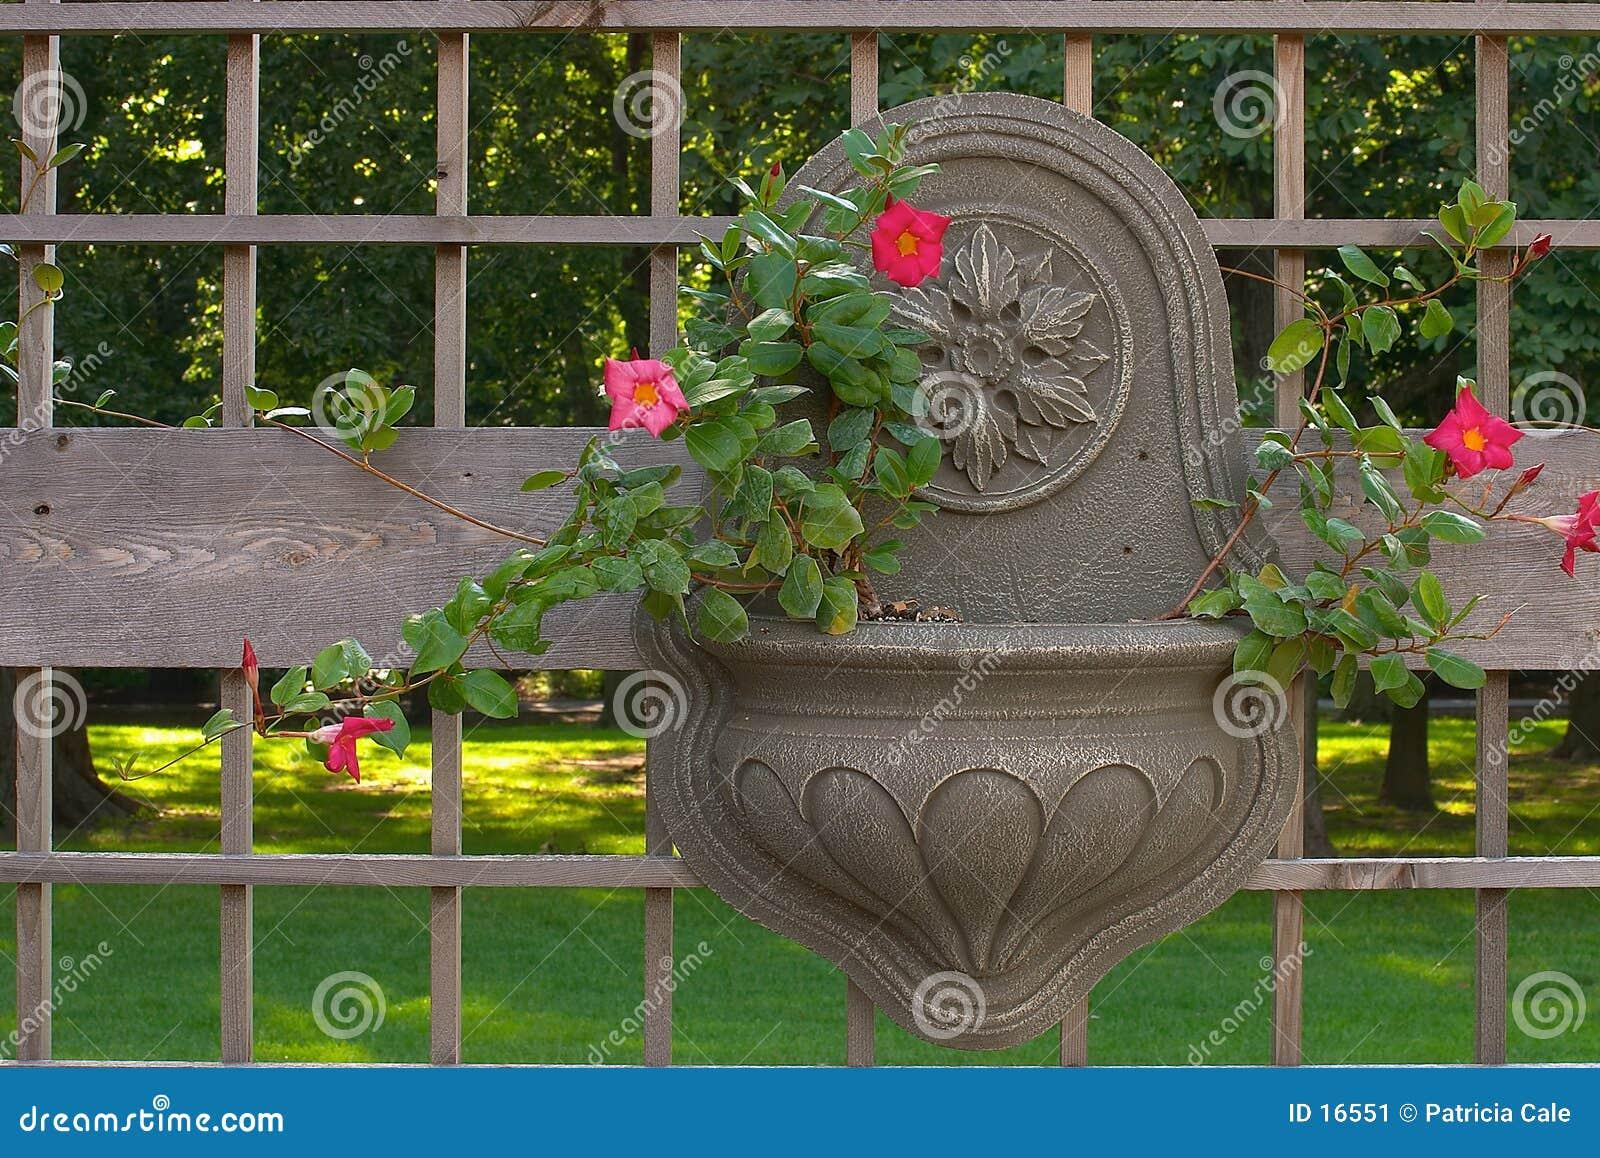 Hängender Garten-Behälter